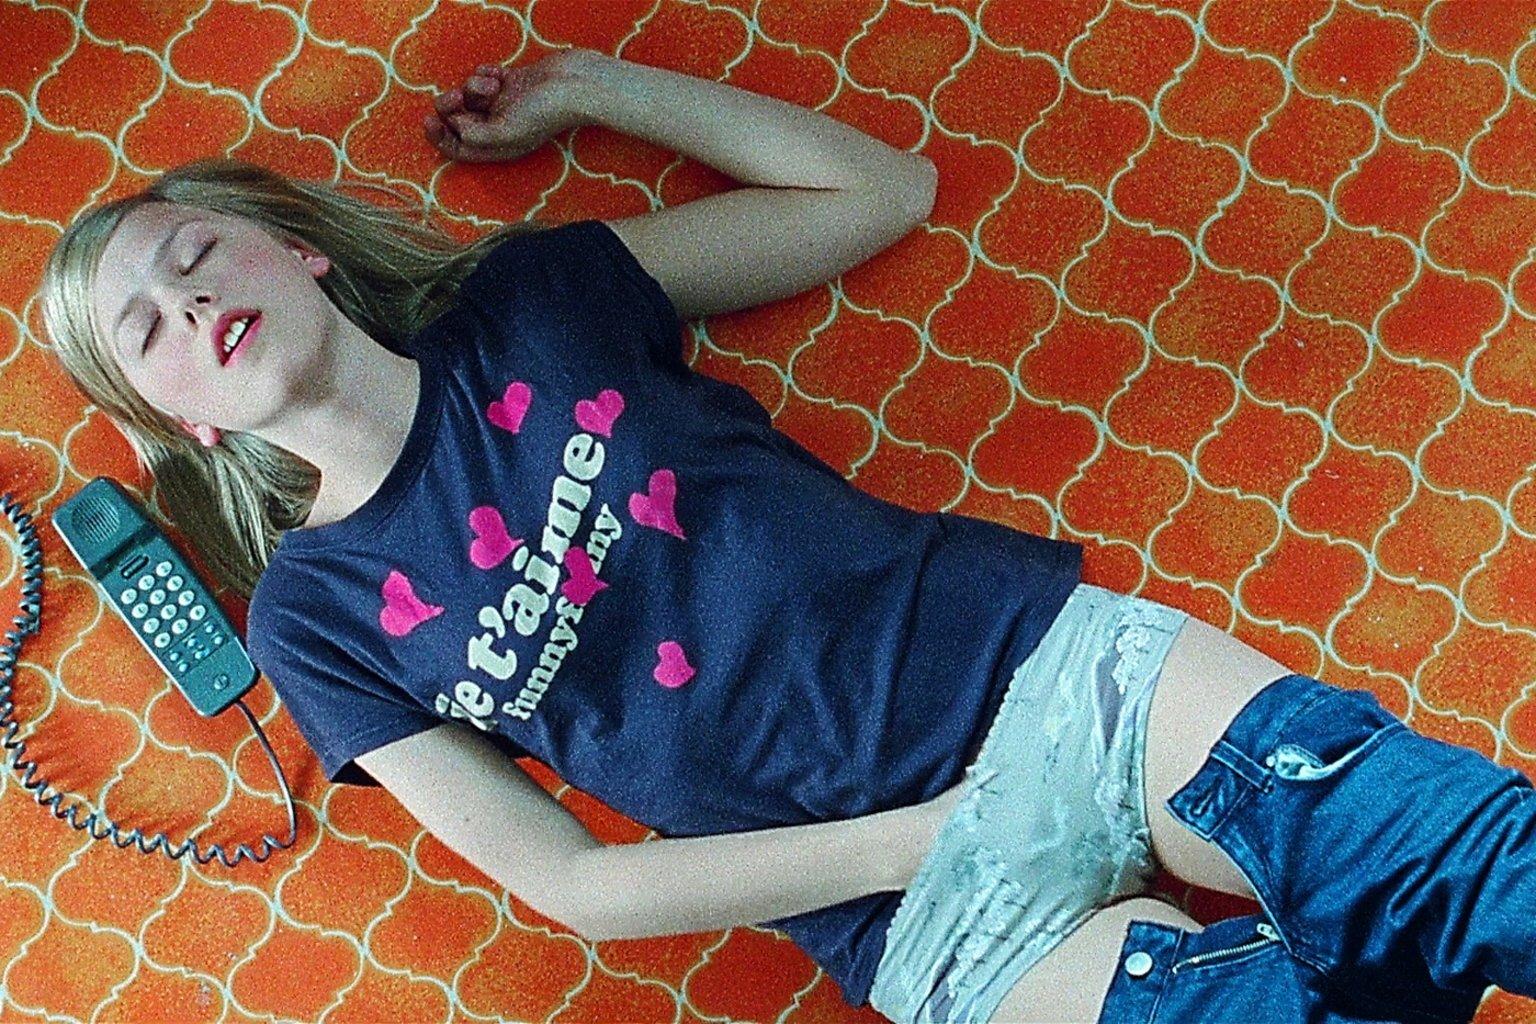 Girl masterbating teen girls story daughter sexy photos